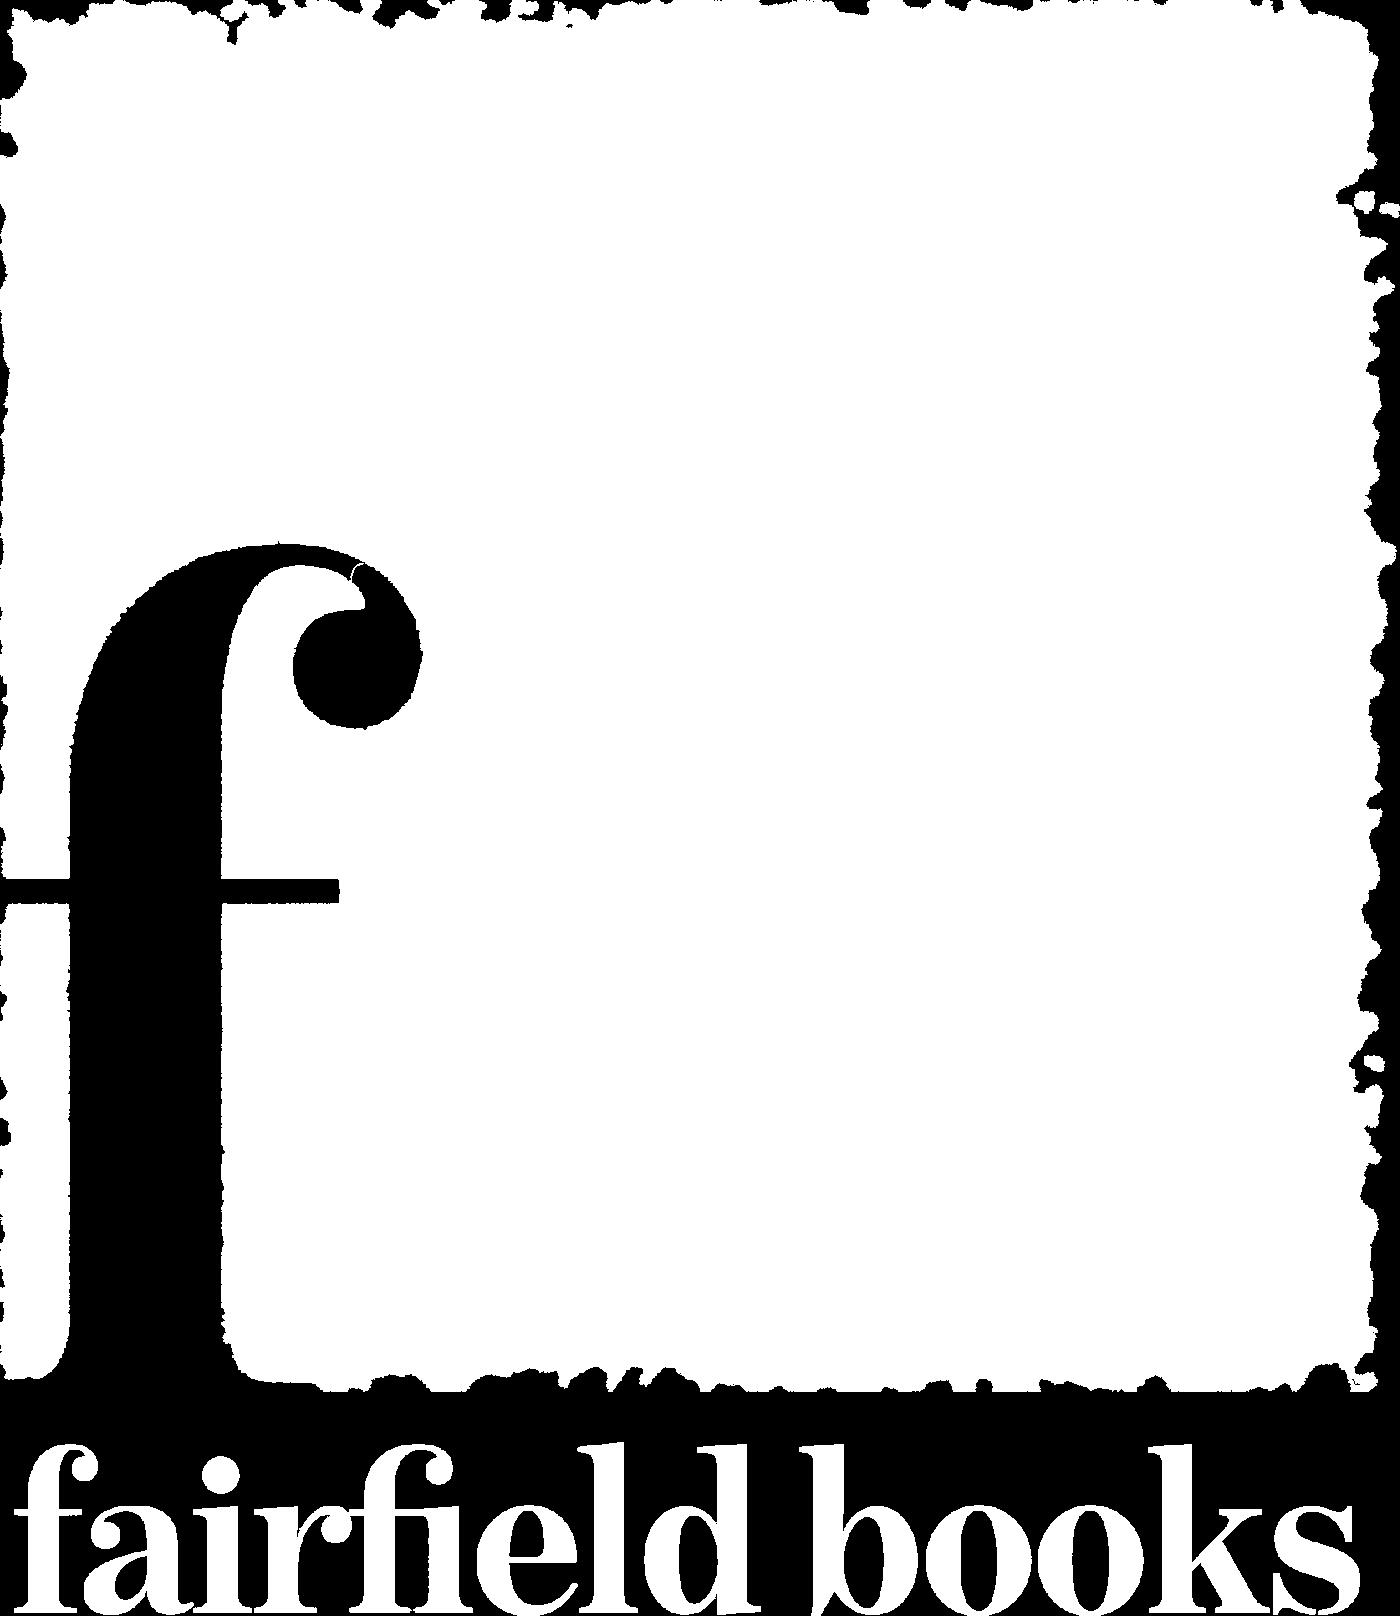 Fairfield Books